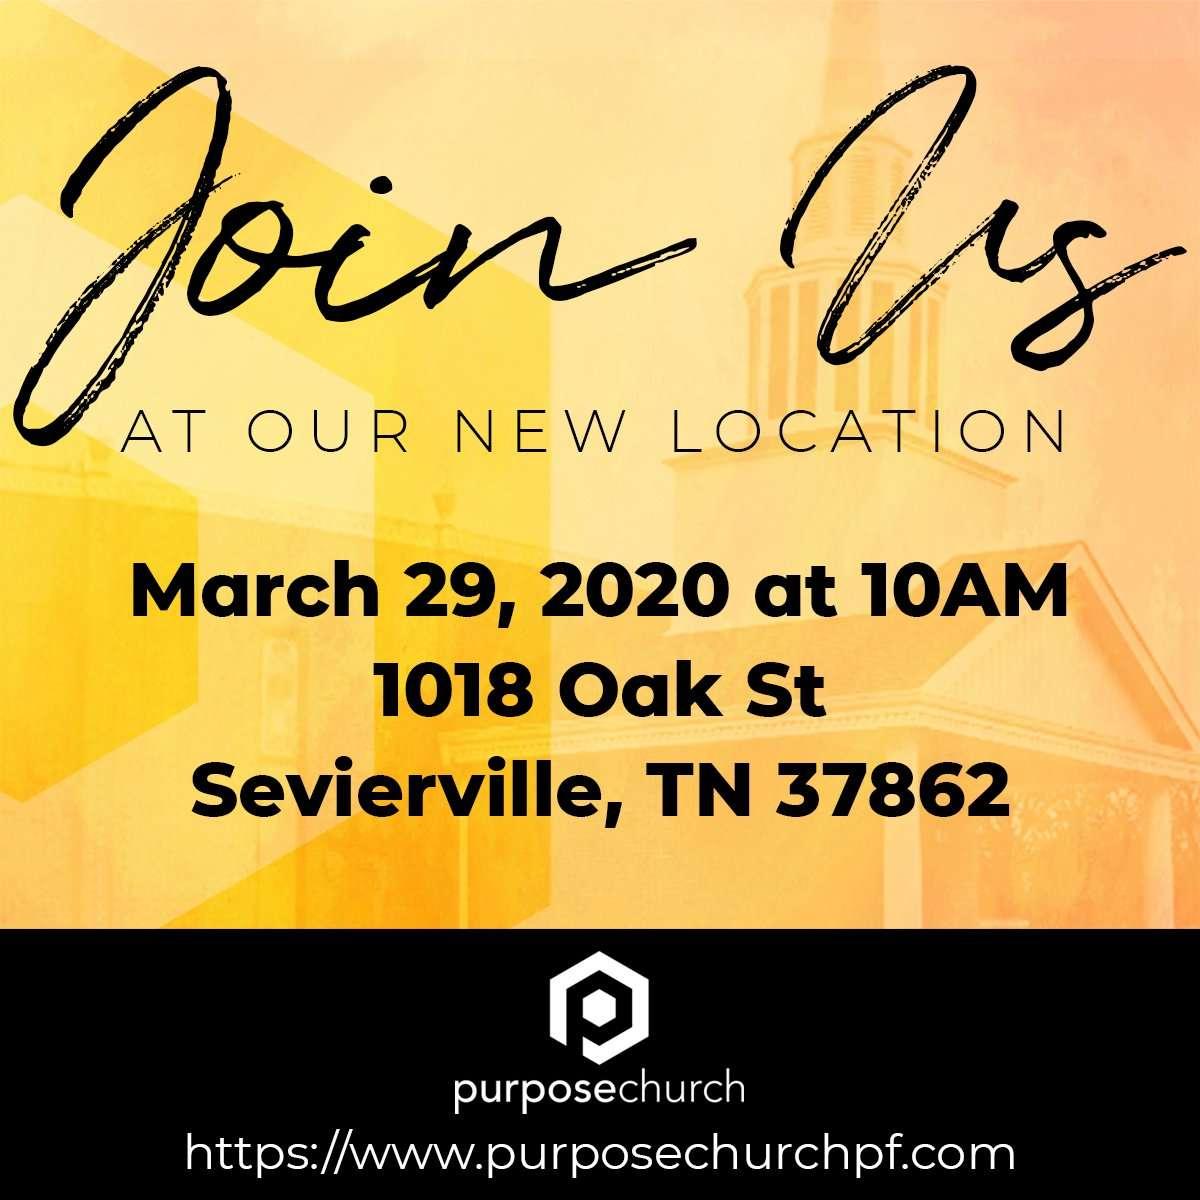 Purpose Church Forward Together Church Merger